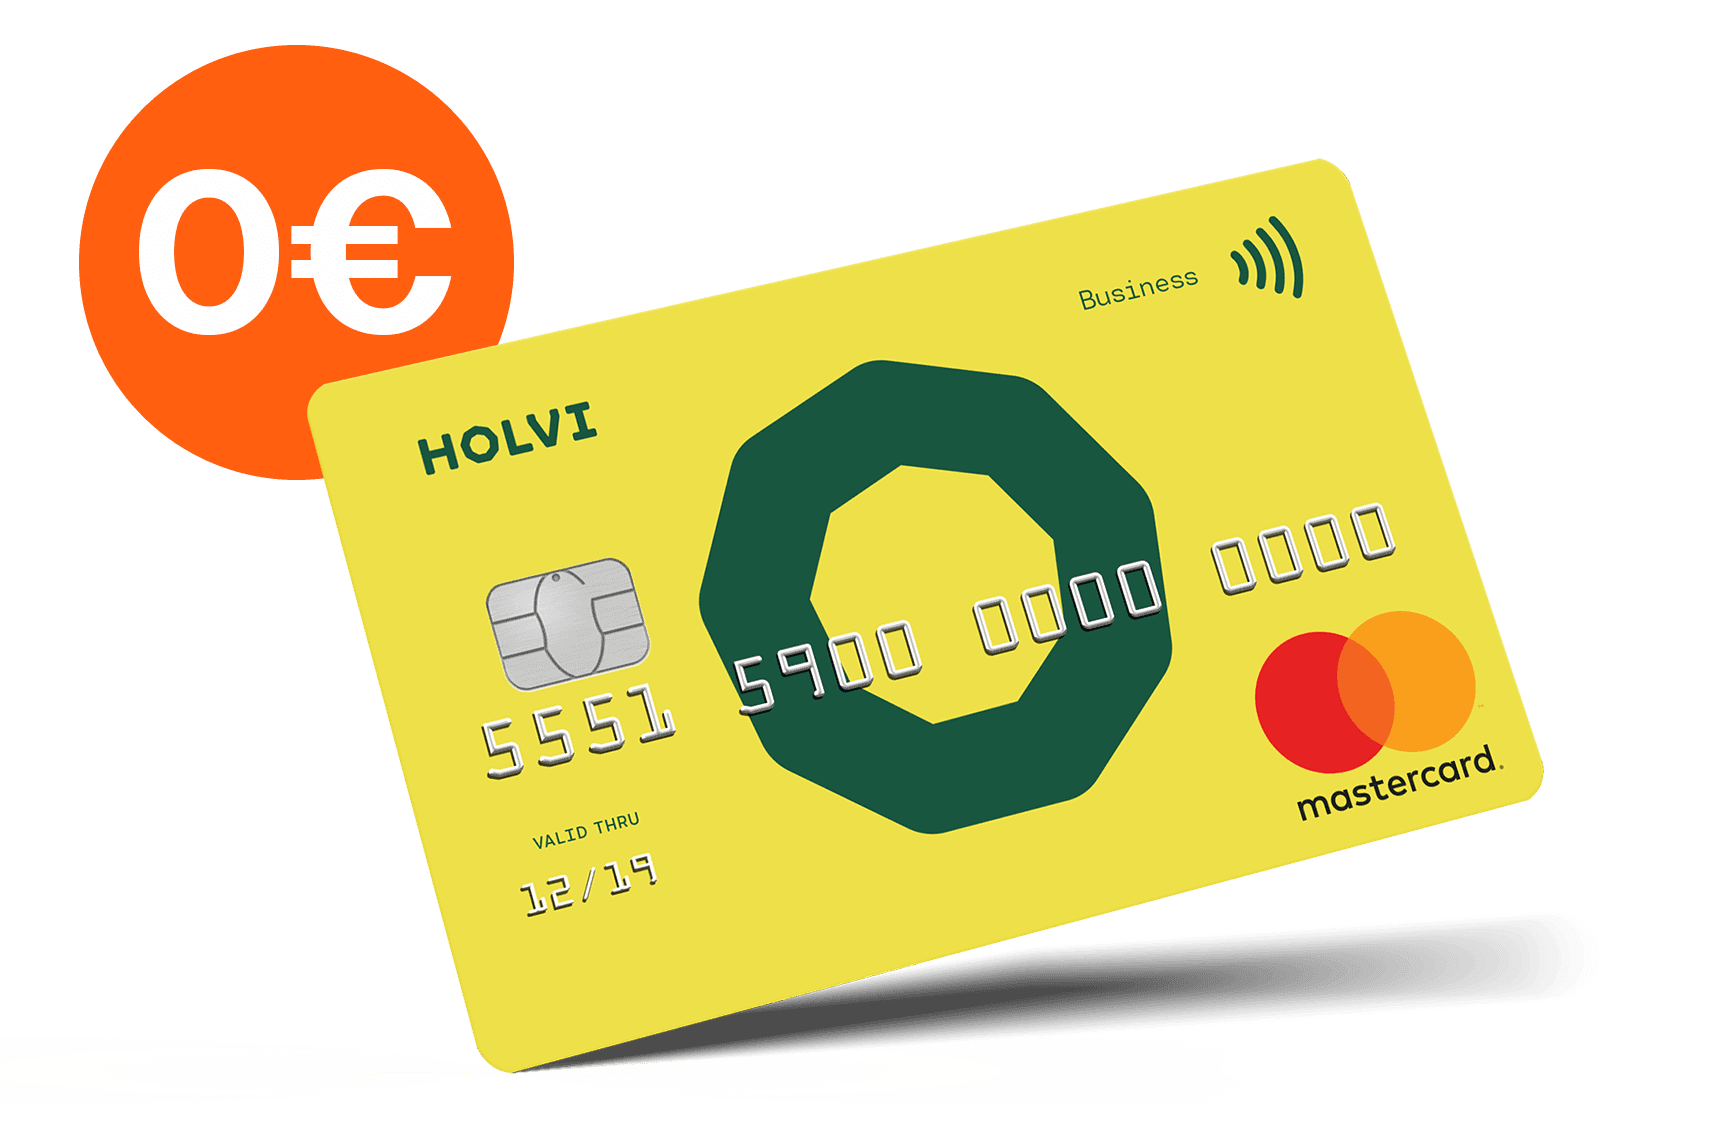 finland mobile bank holvi